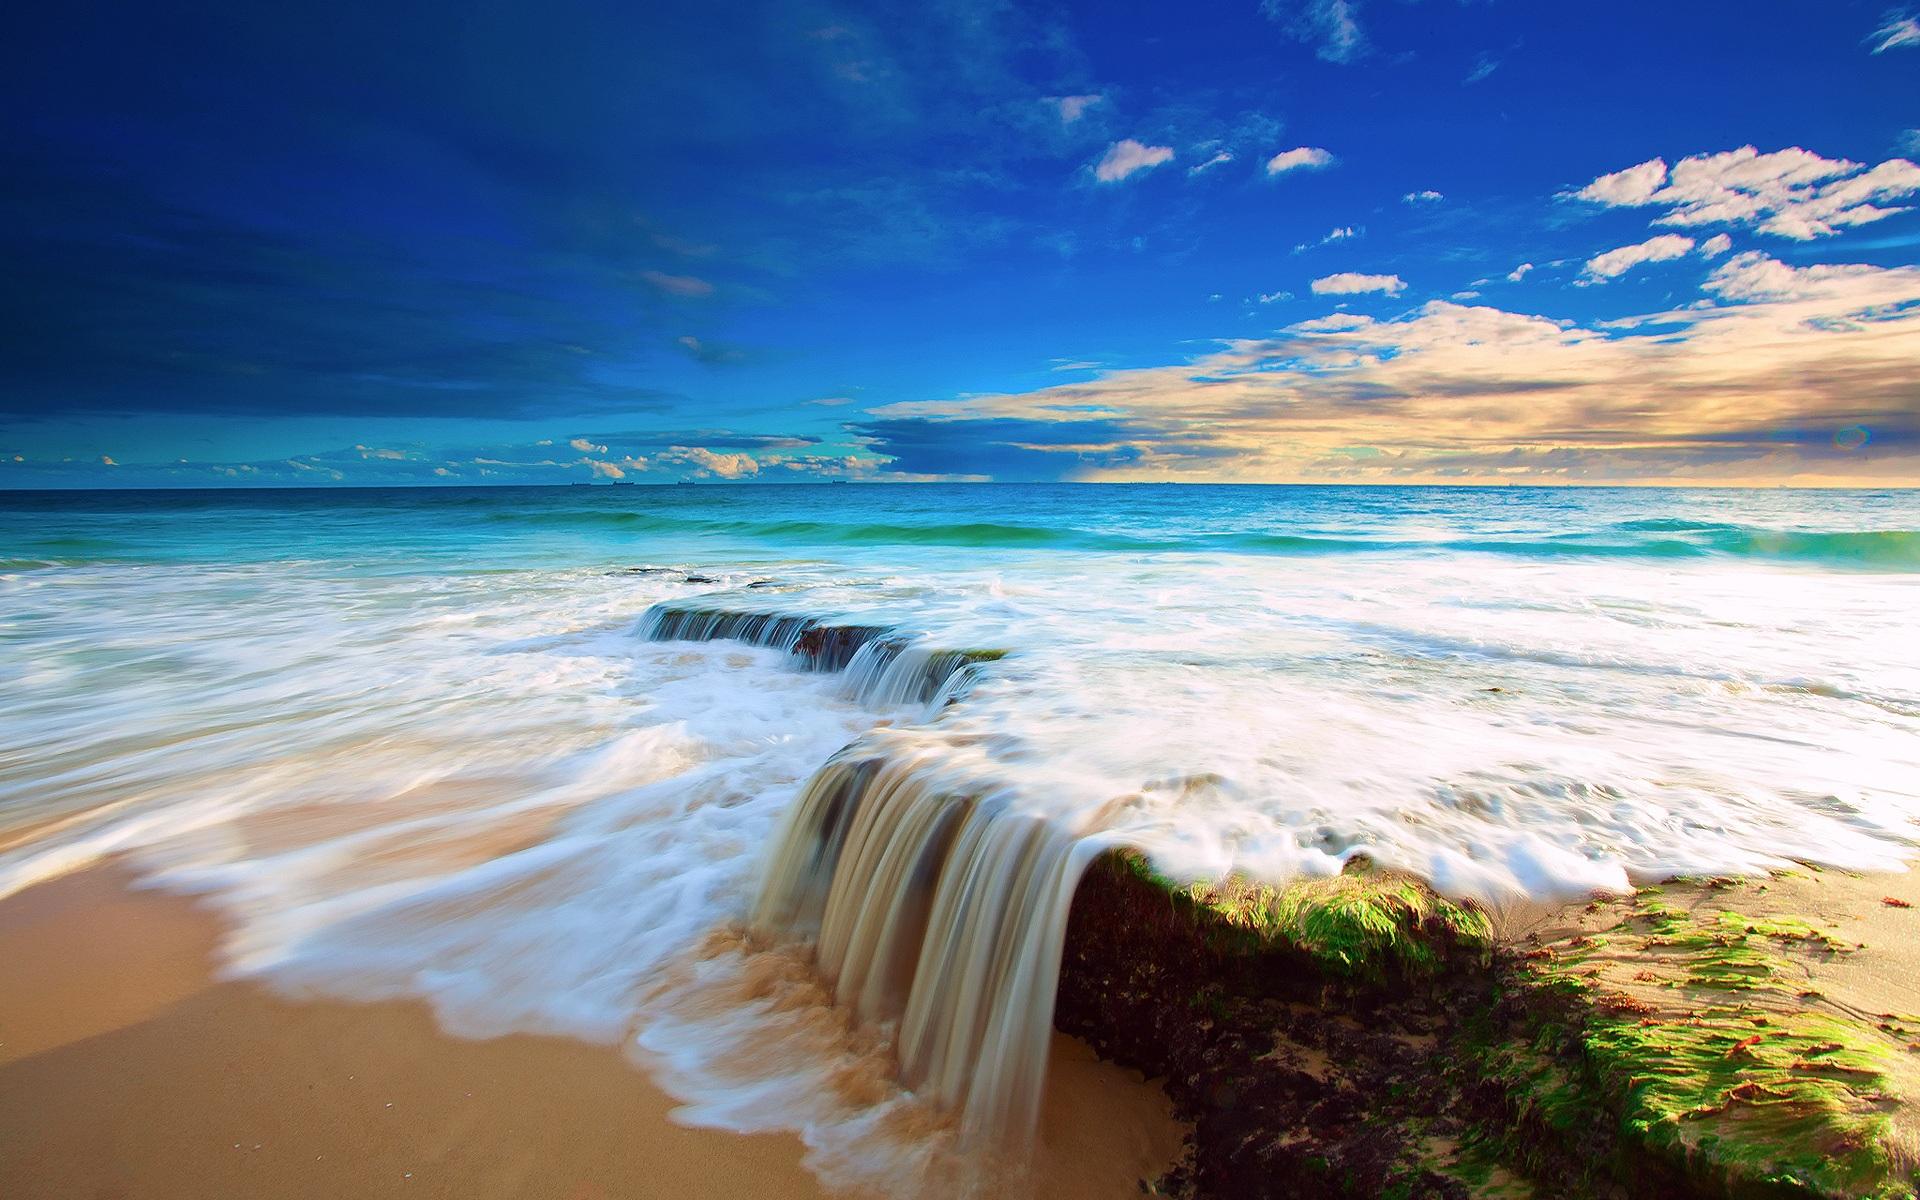 beach waterfall beautiful scenery sky clouds wallpaper 1920x1200